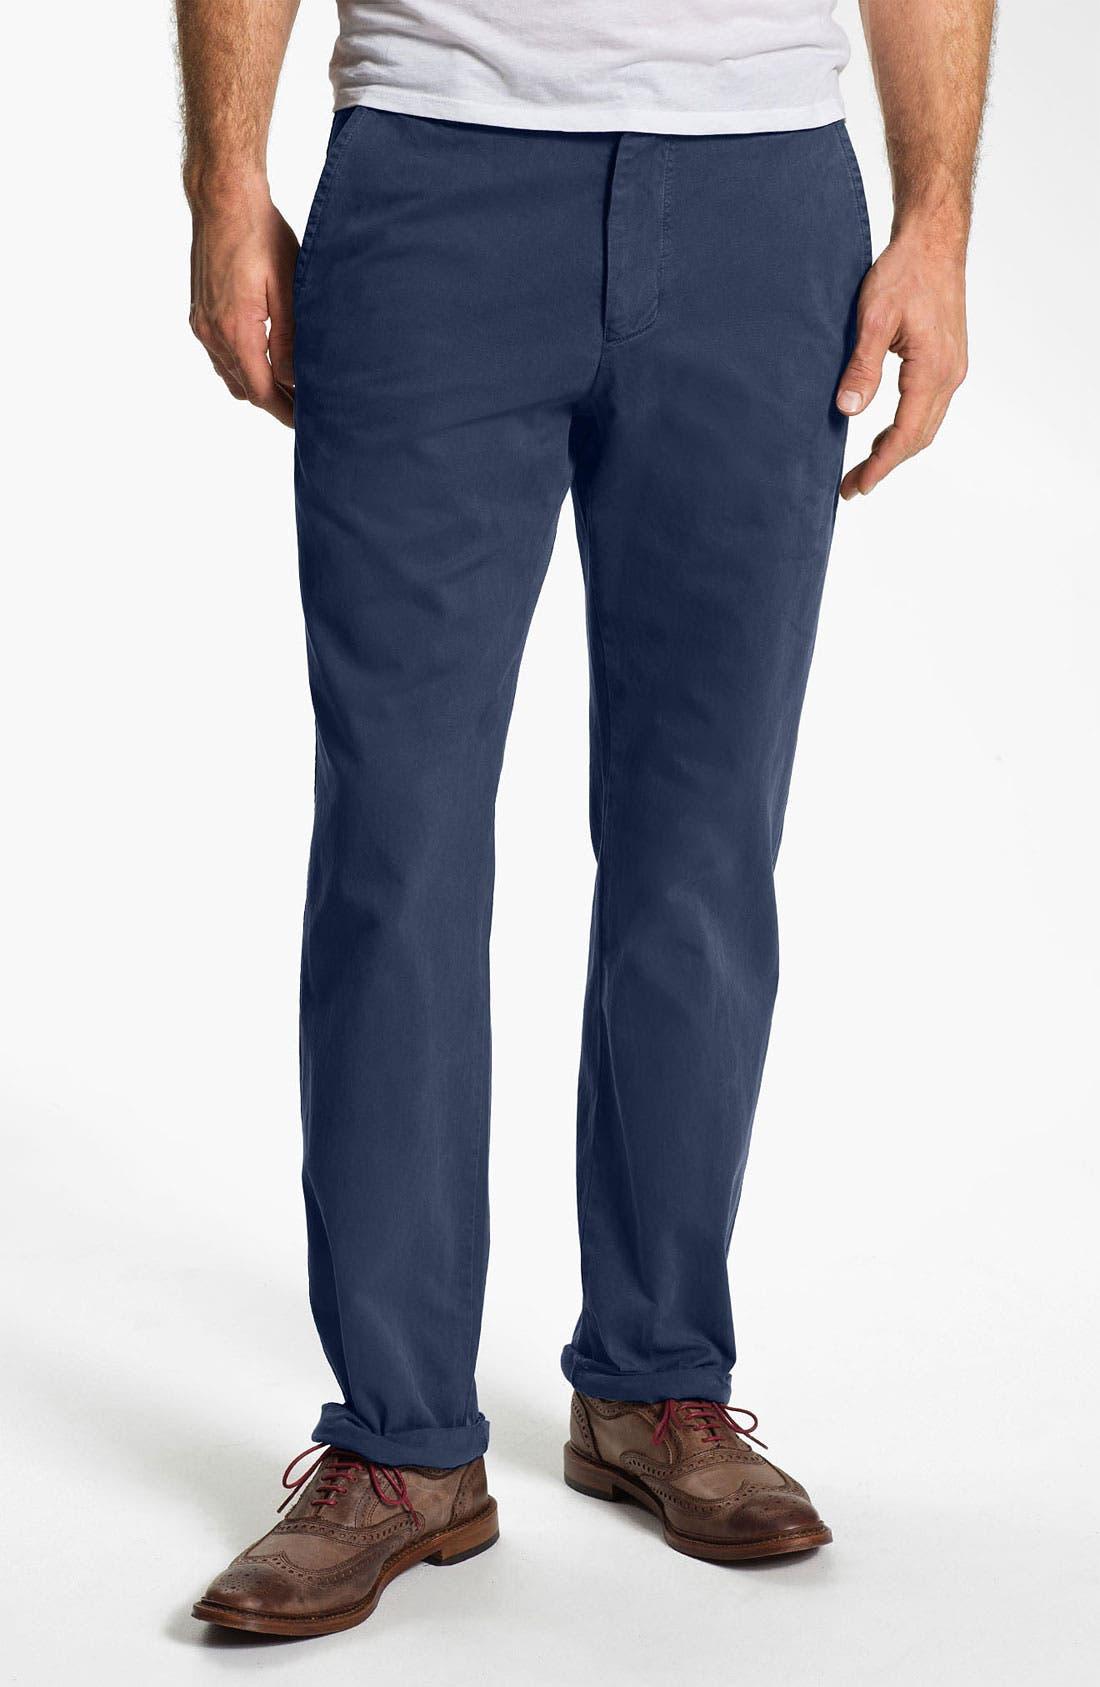 Main Image - Khaki Surplus Straight Leg Washed Cotton Twill Chinos (Online Only)